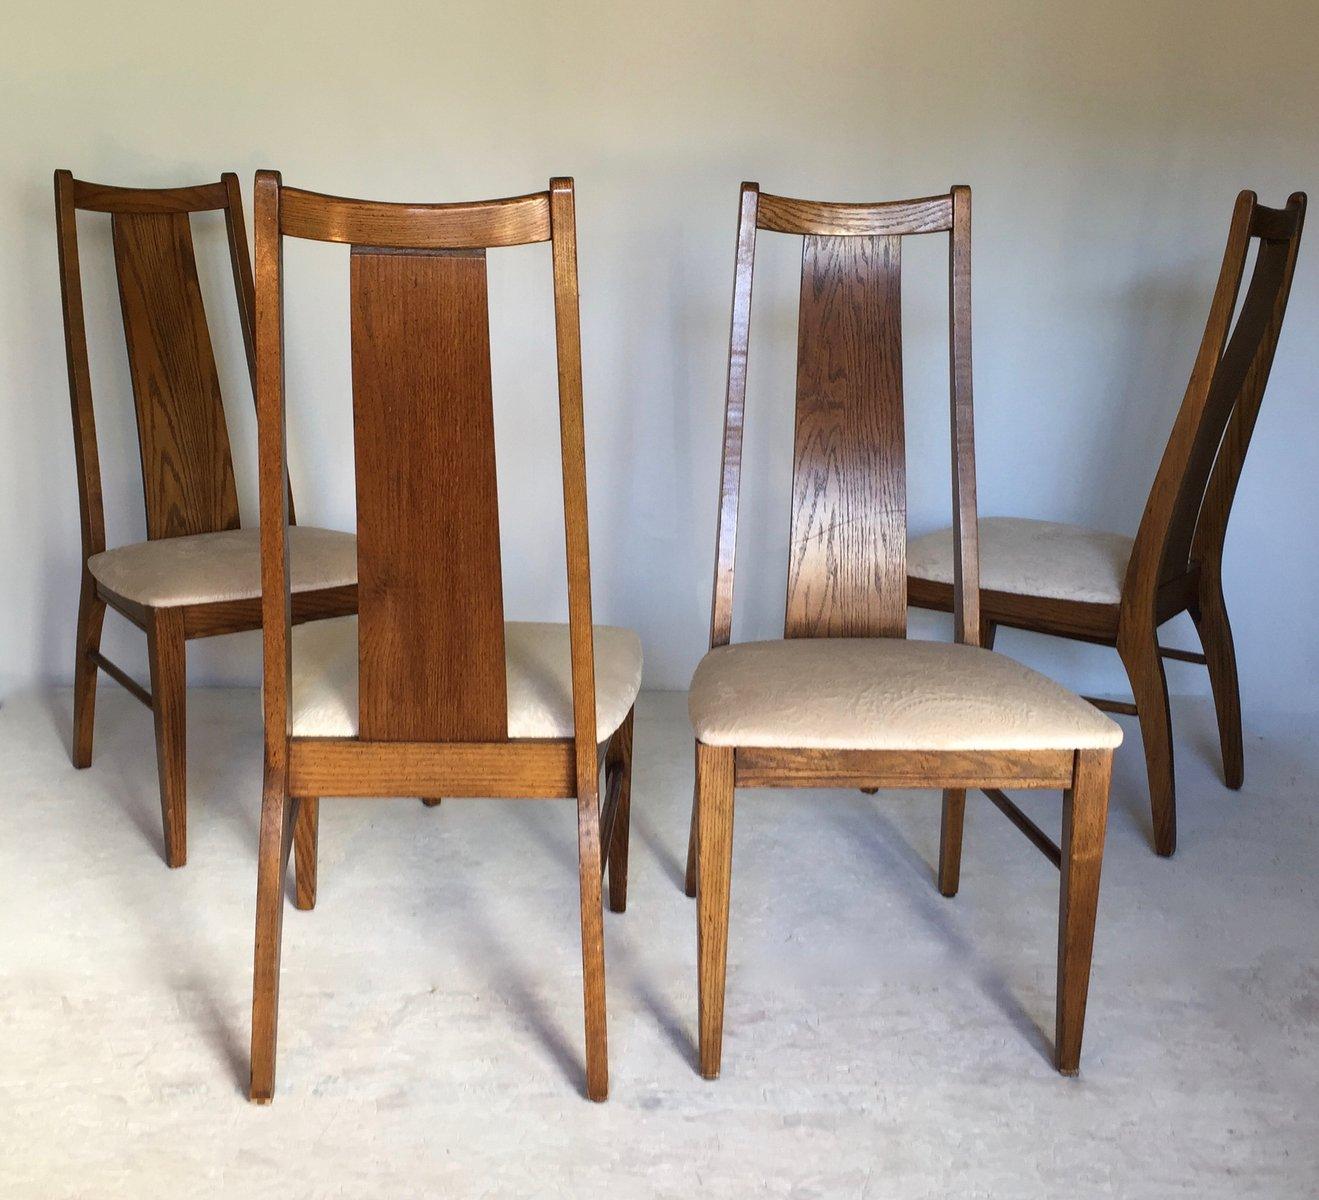 amerikanische st hle von garrison furniture company. Black Bedroom Furniture Sets. Home Design Ideas